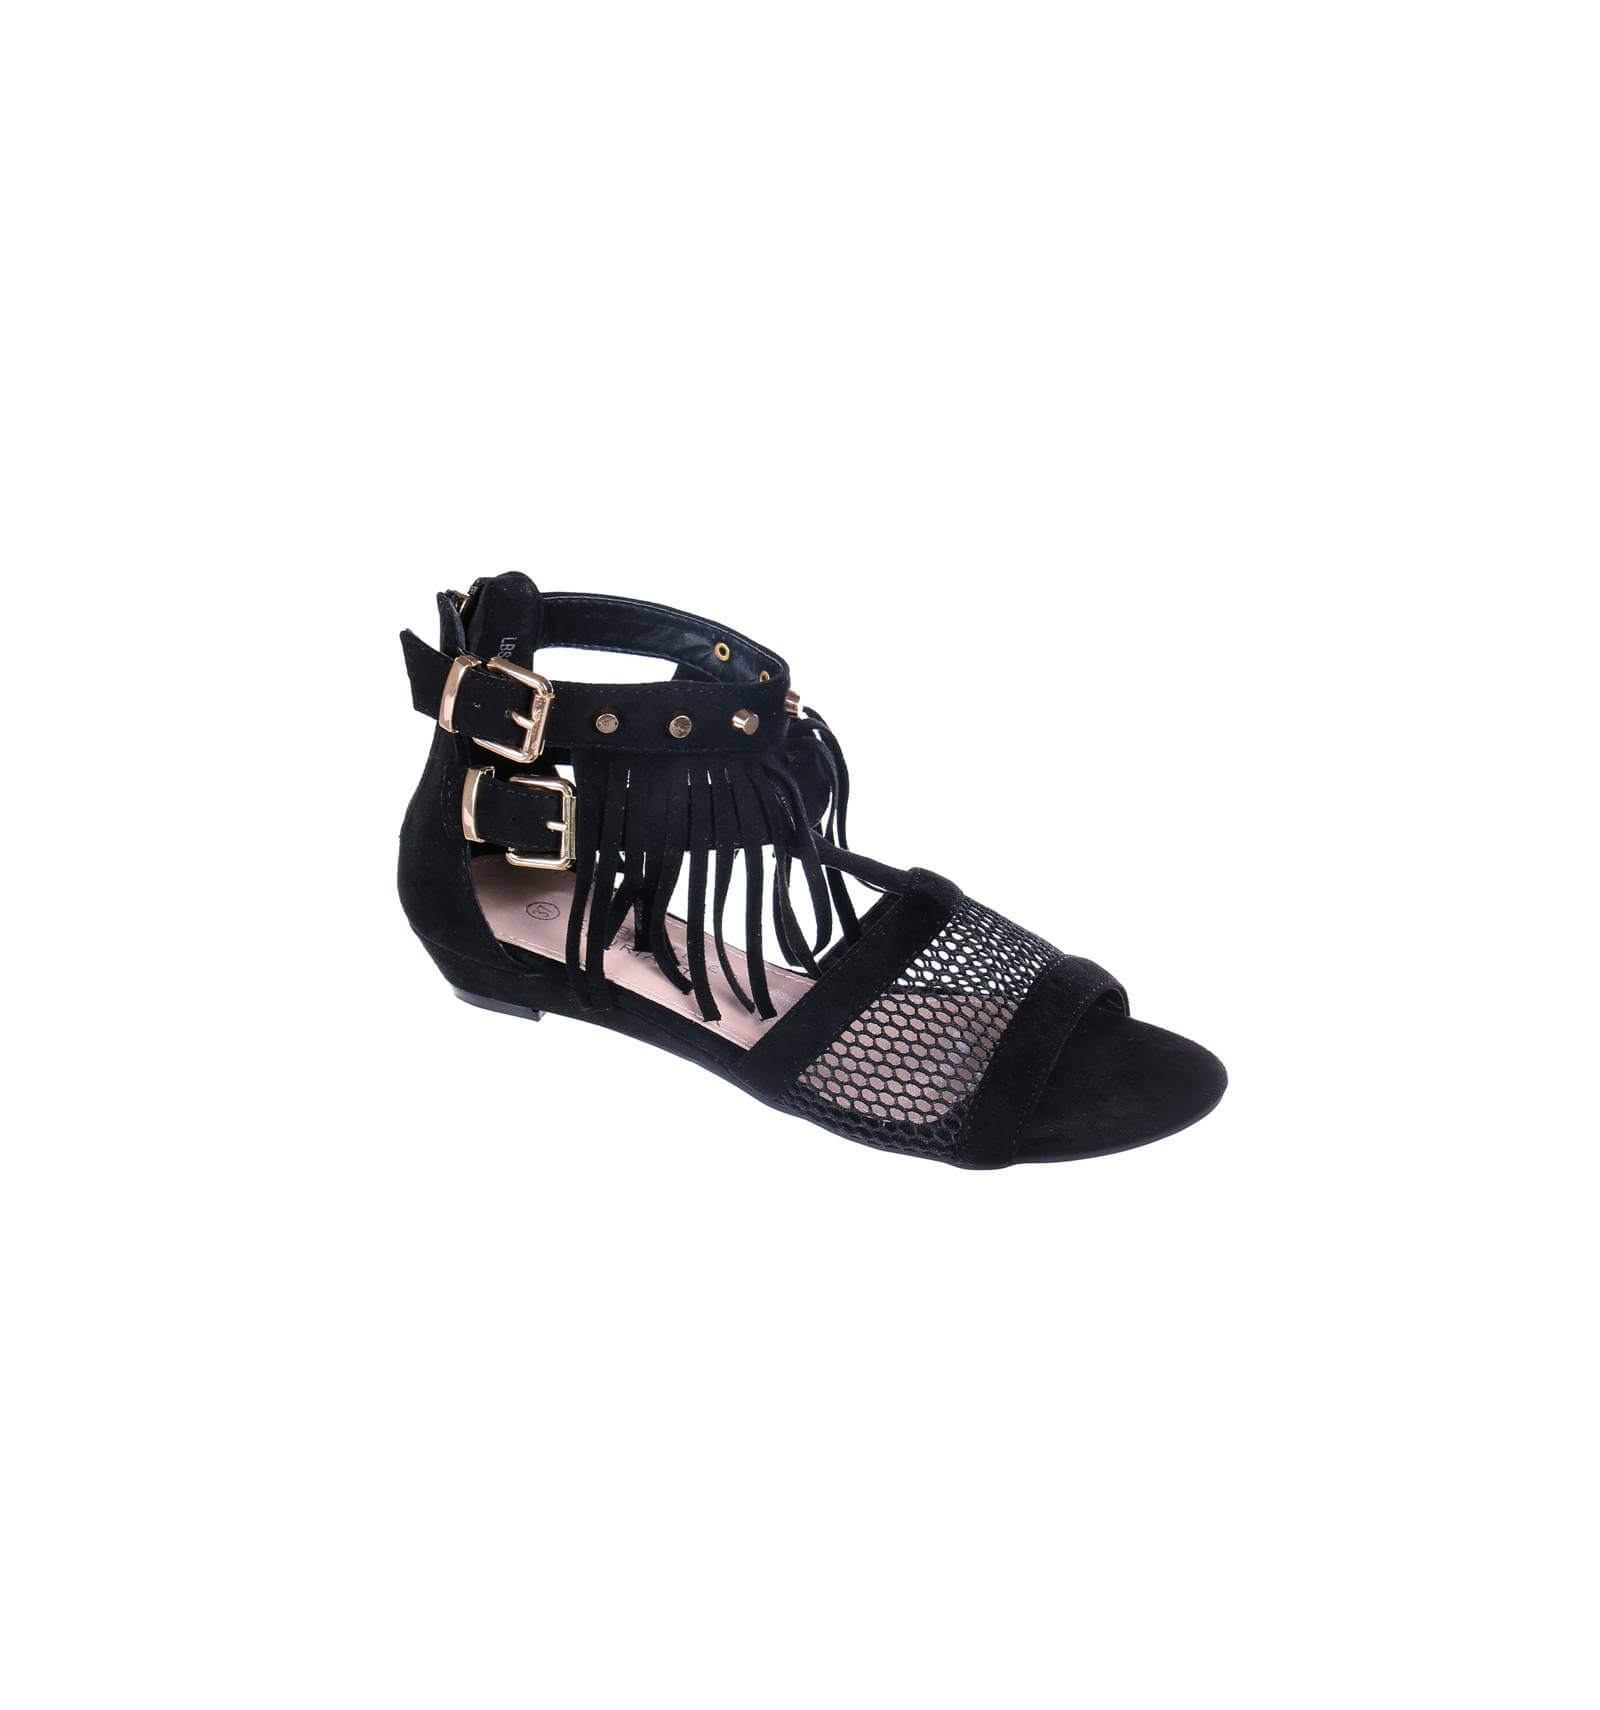 sandale femme simili cuir compens e franges noir lucia. Black Bedroom Furniture Sets. Home Design Ideas